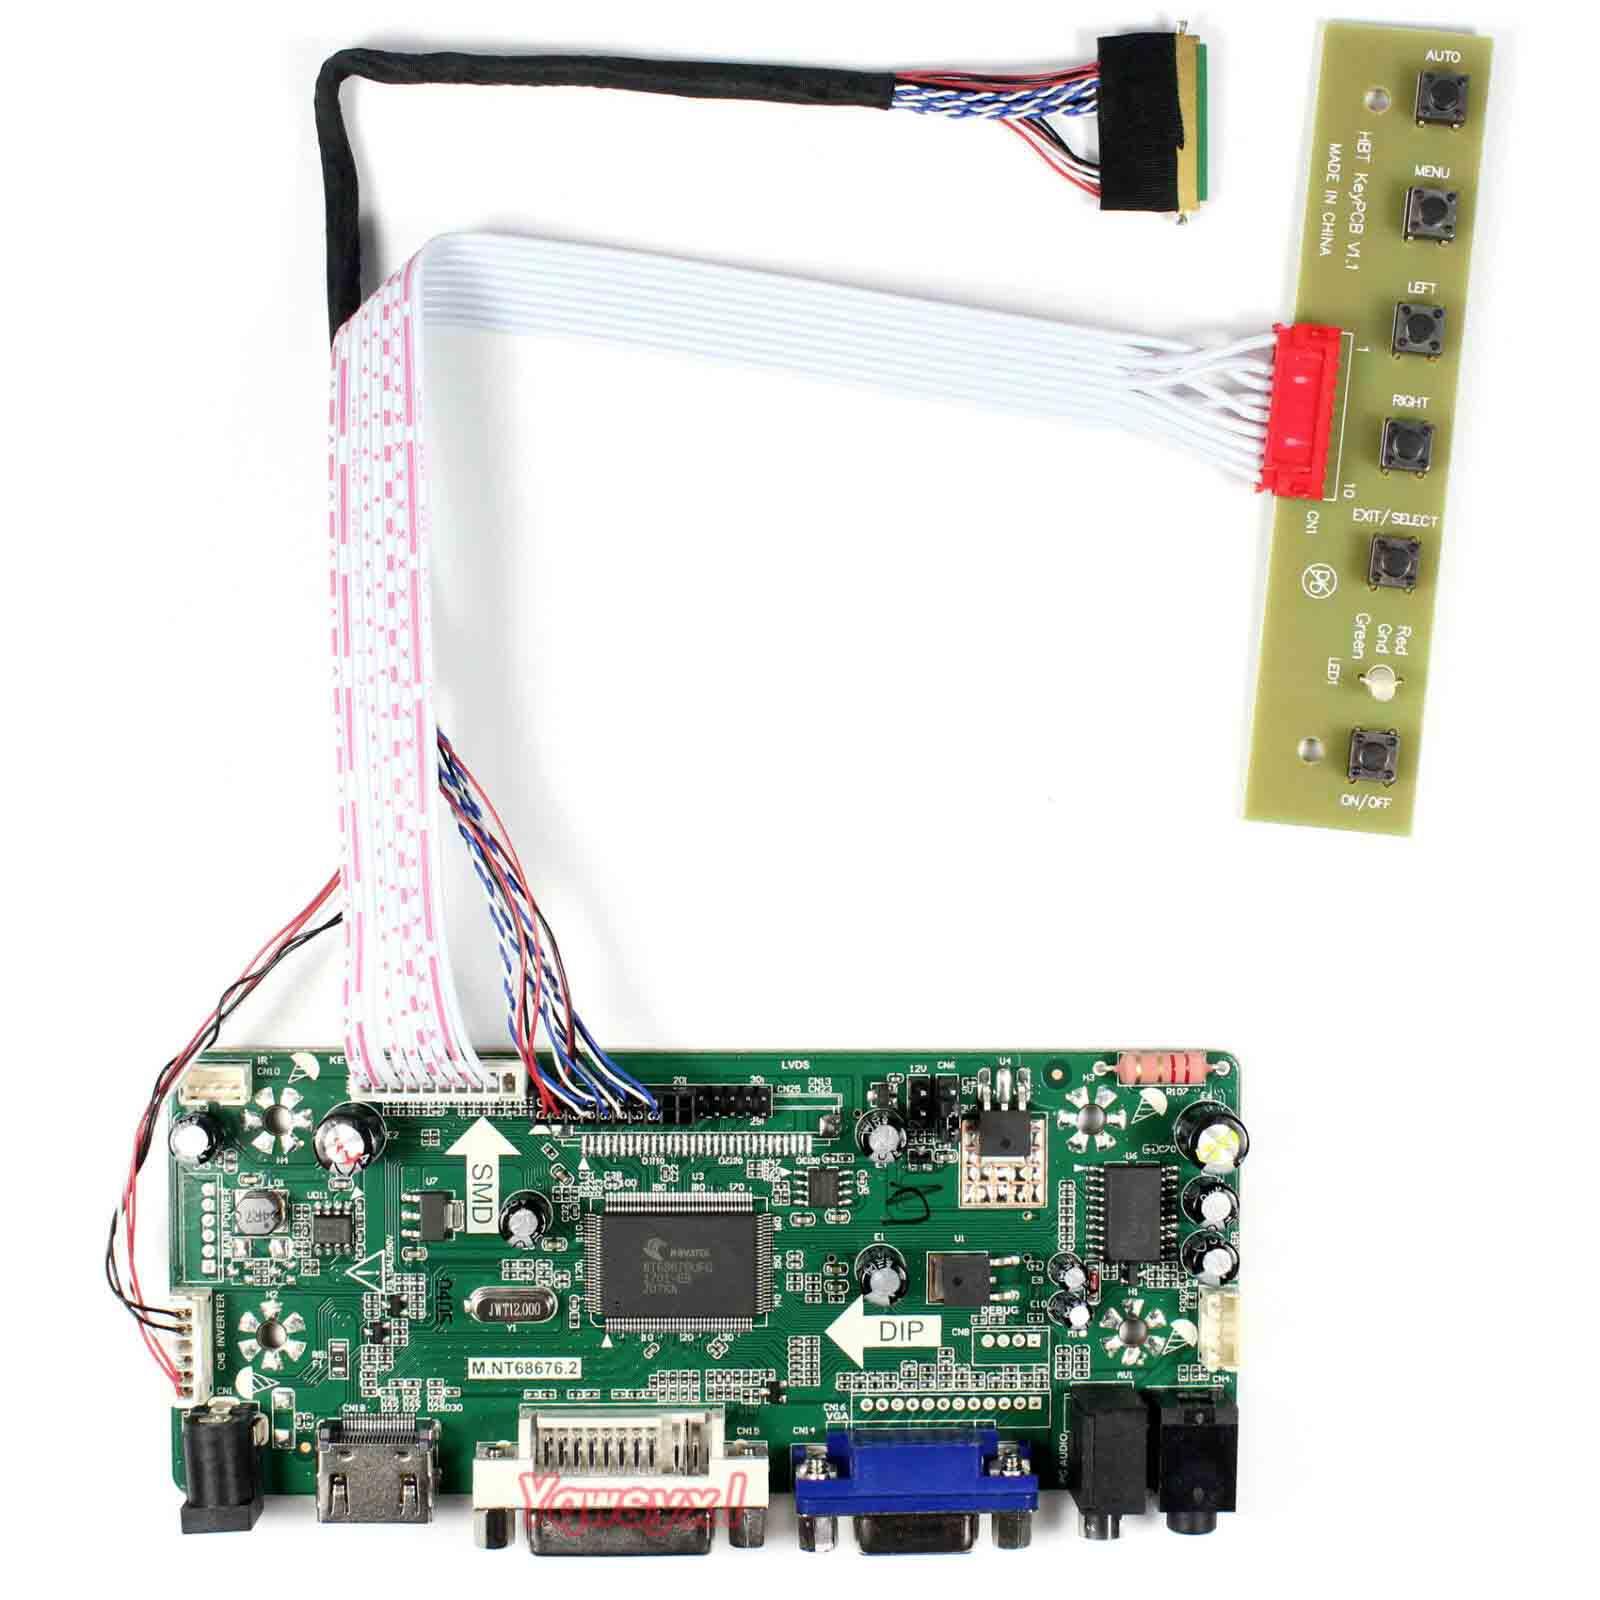 Yqwsyxl placa de controle monitor kit para HSD140PHW1-A00 HSD140PHW1-A01 hdmi + dvi vga lcd led placa controlador driver